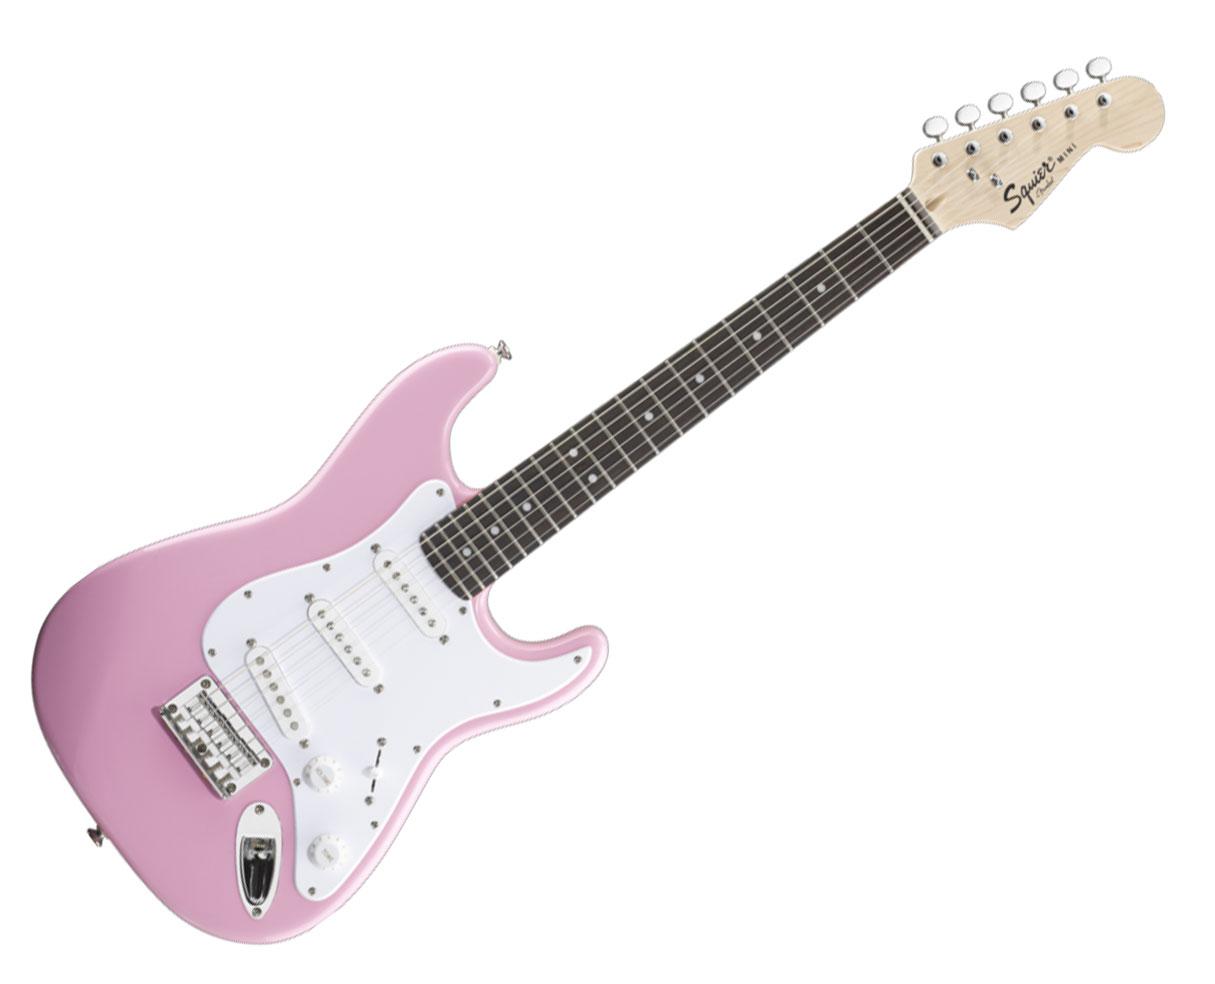 fender squier mini stratocaster guitar rosewood pink strat proaudiostar ebay. Black Bedroom Furniture Sets. Home Design Ideas